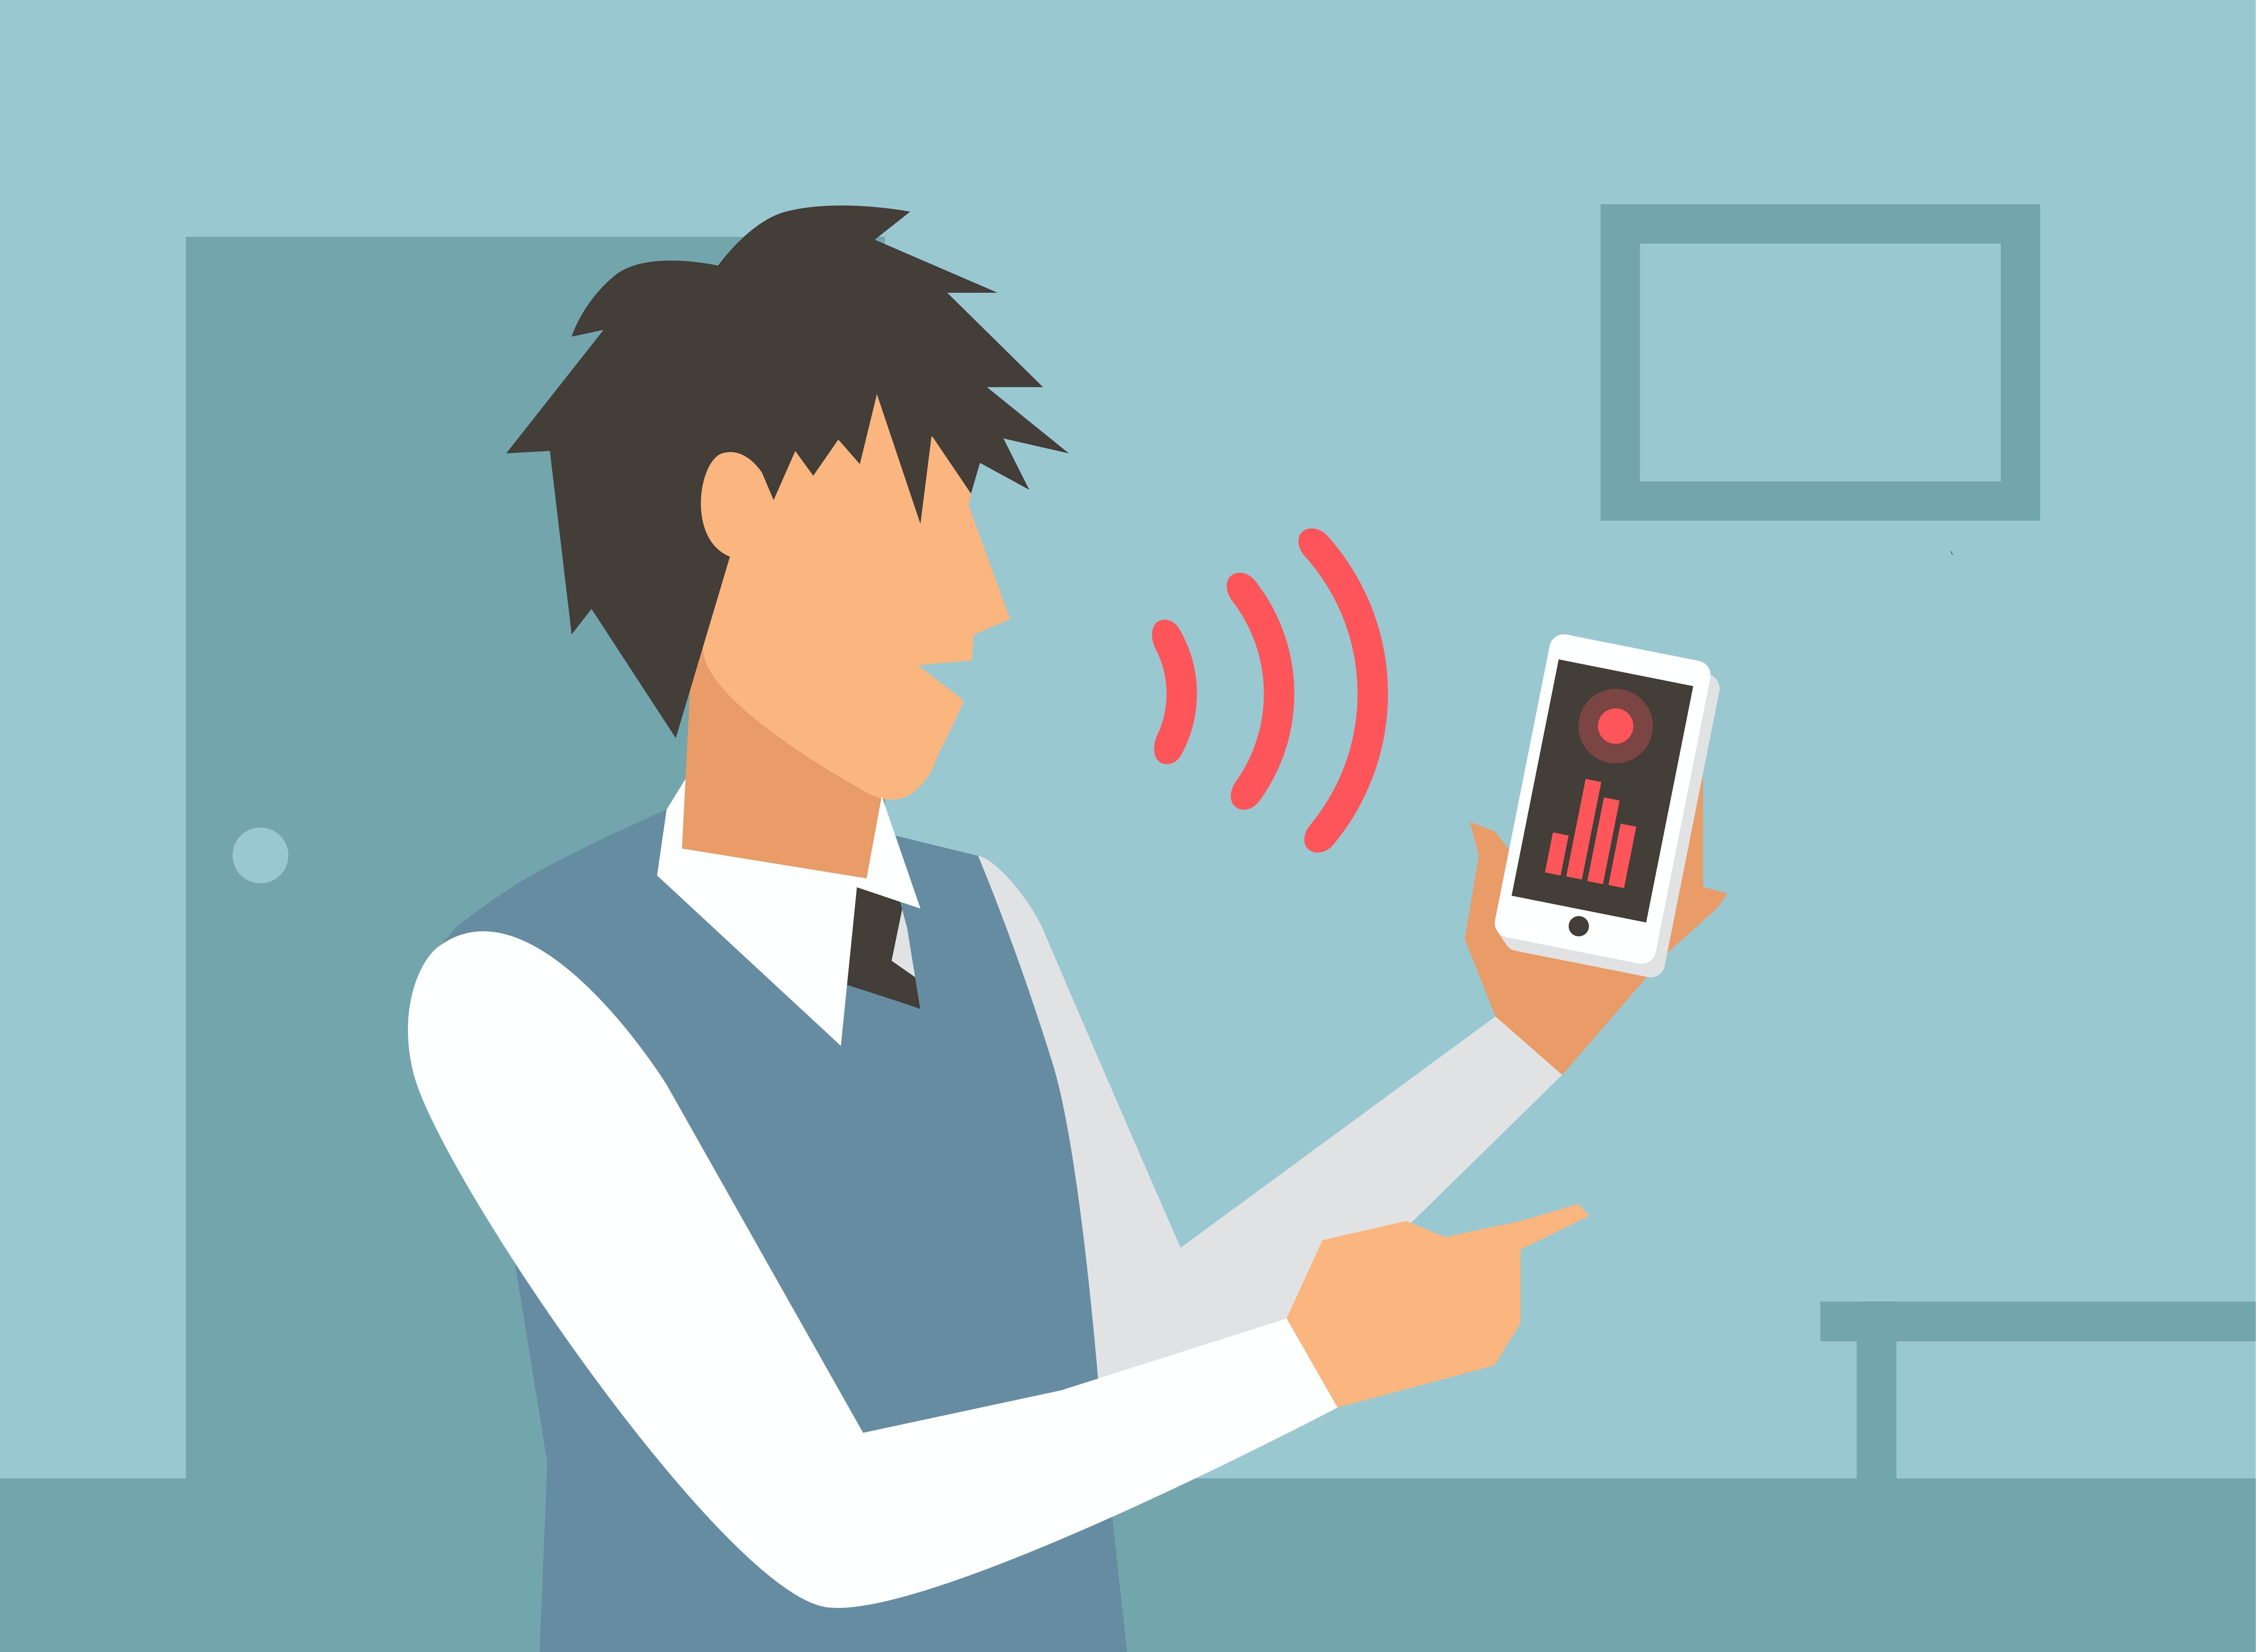 Voice control | Source: Shutterstock